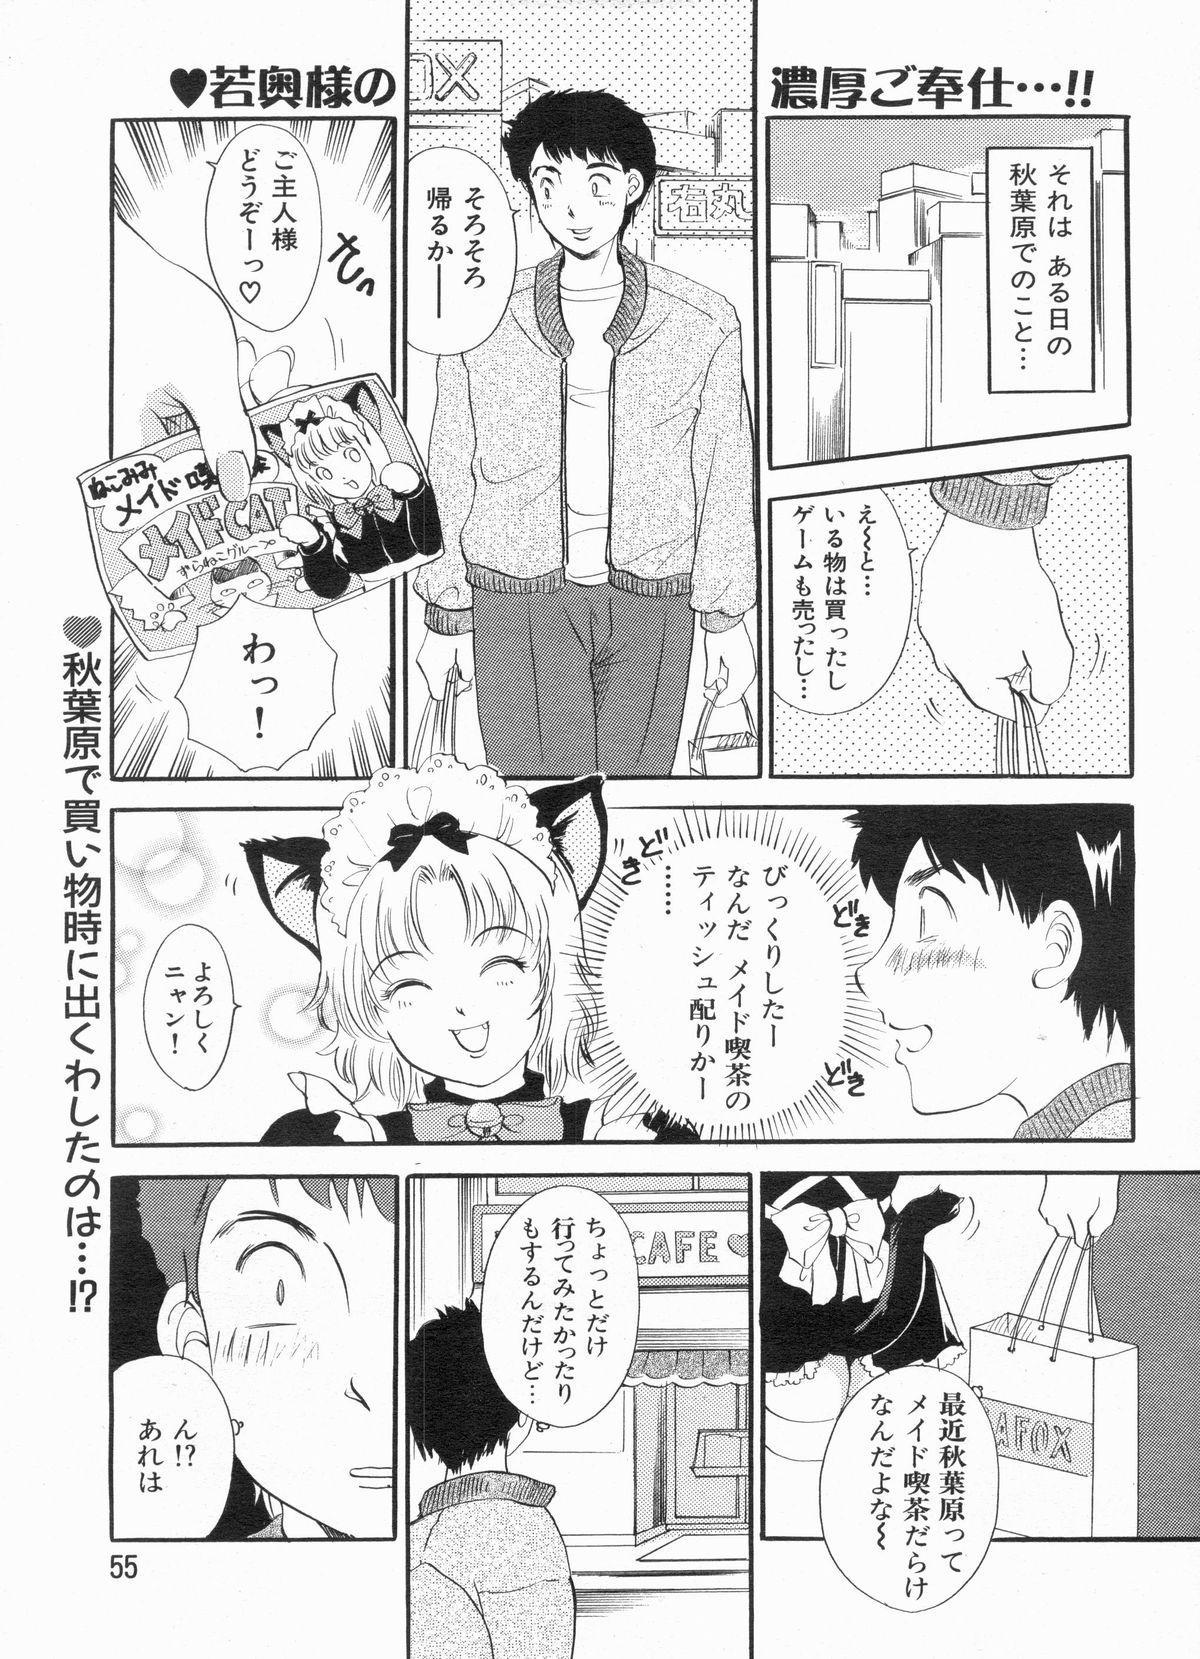 Manga Bon 2013-03 53